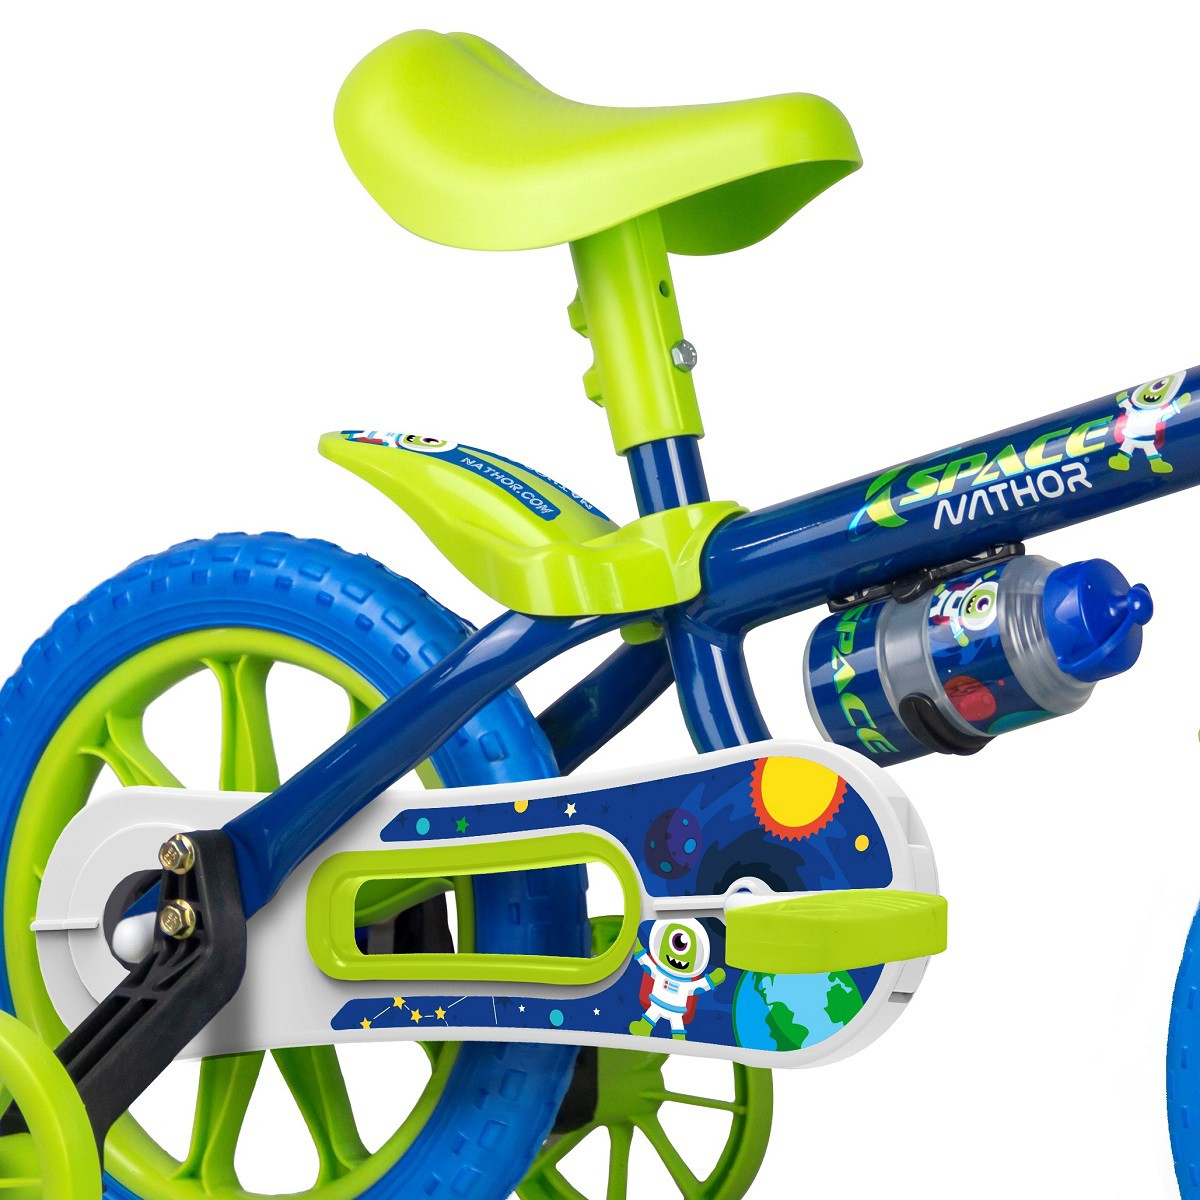 Bicicleta aro 12 Space 2 Nathor